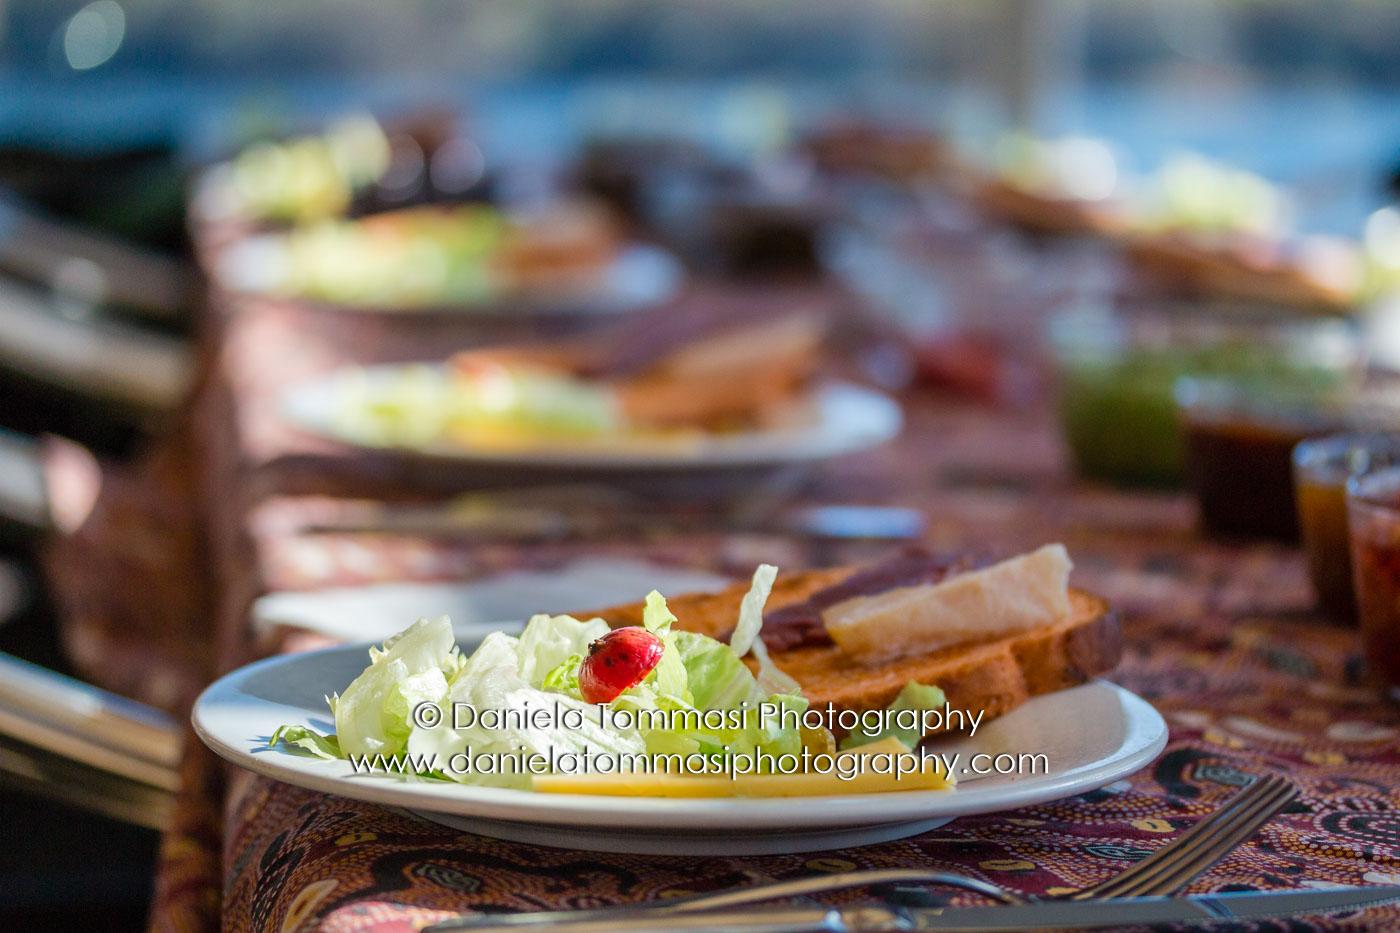 Restaurant-Daniela Tommasi Photography-2